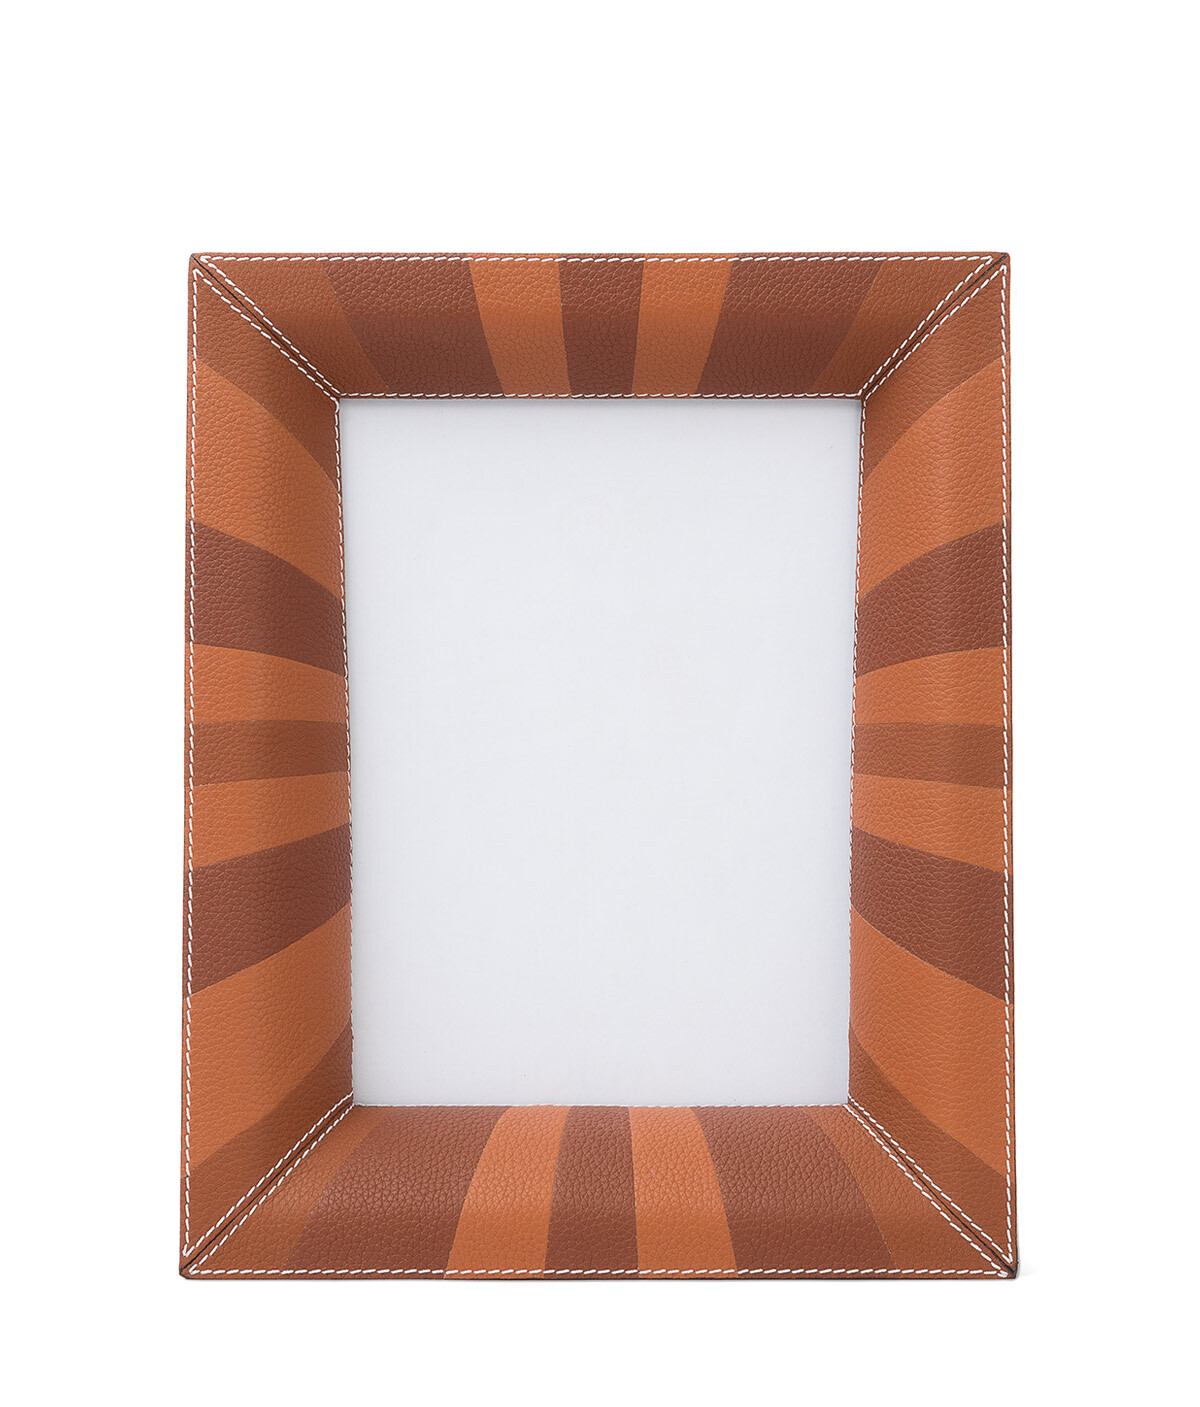 LOEWE Photo Frame Tan Multitone front